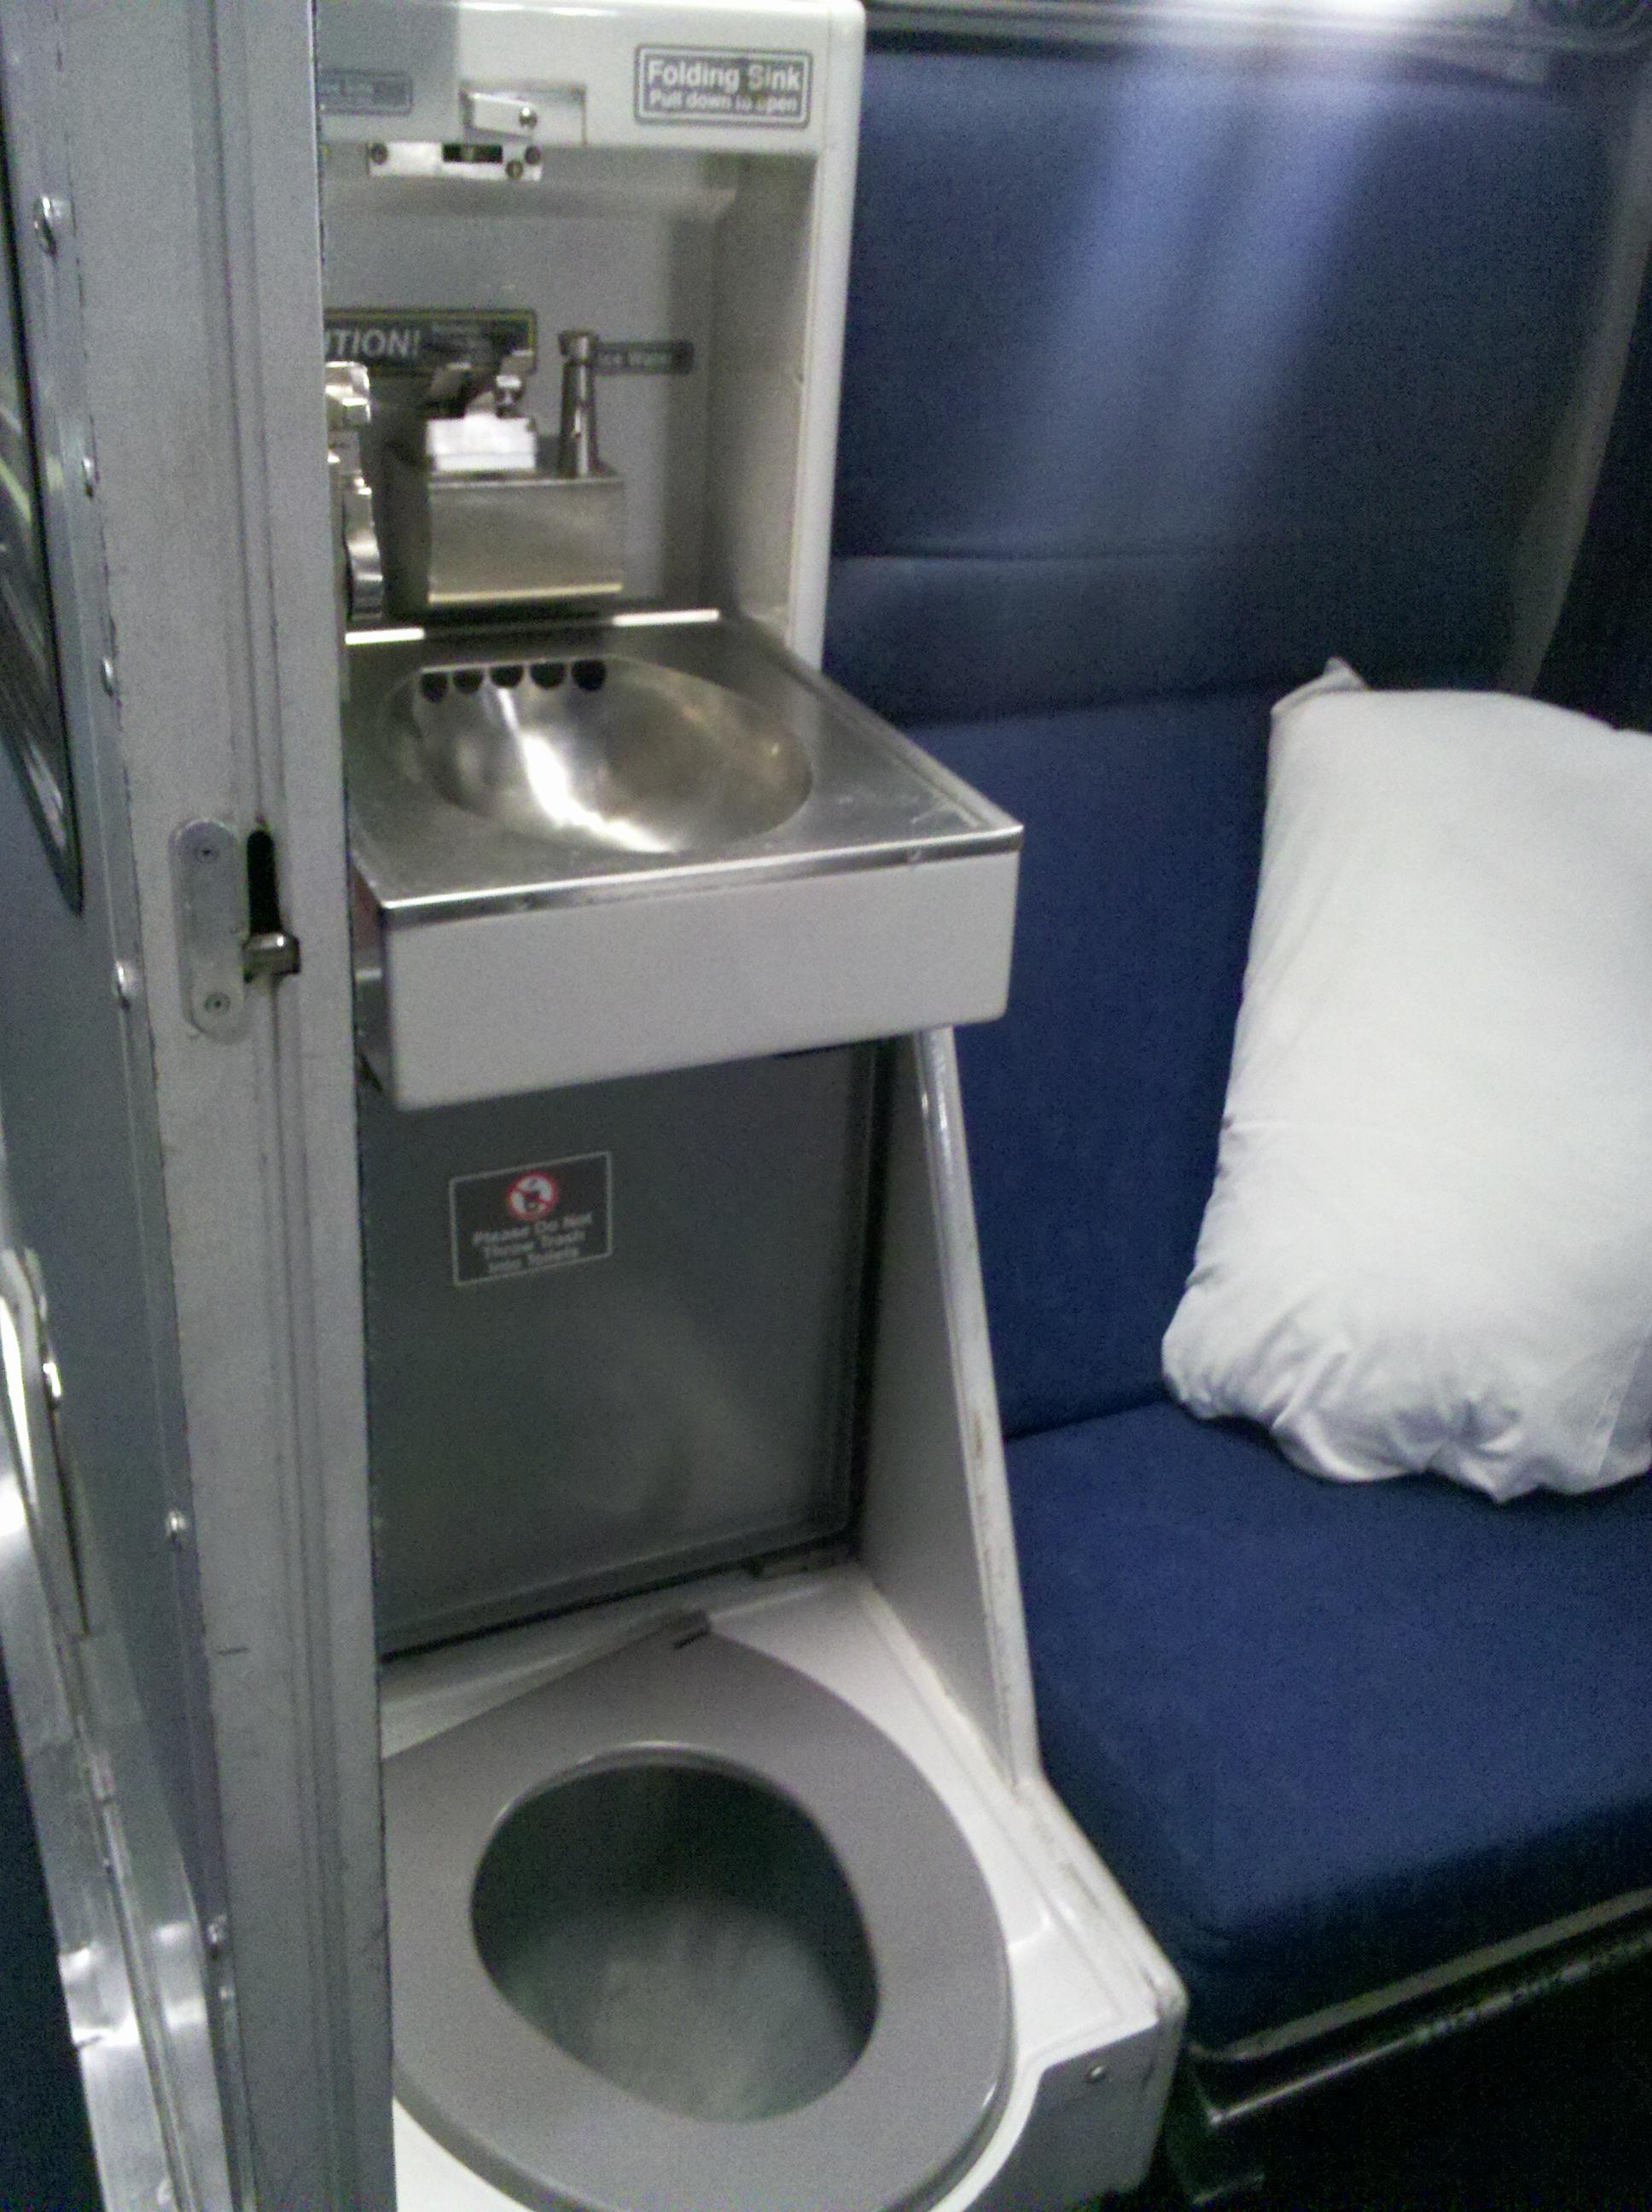 Roomette Toilet Sink Viewliner Amtrak Train Marla Sink Druzgal